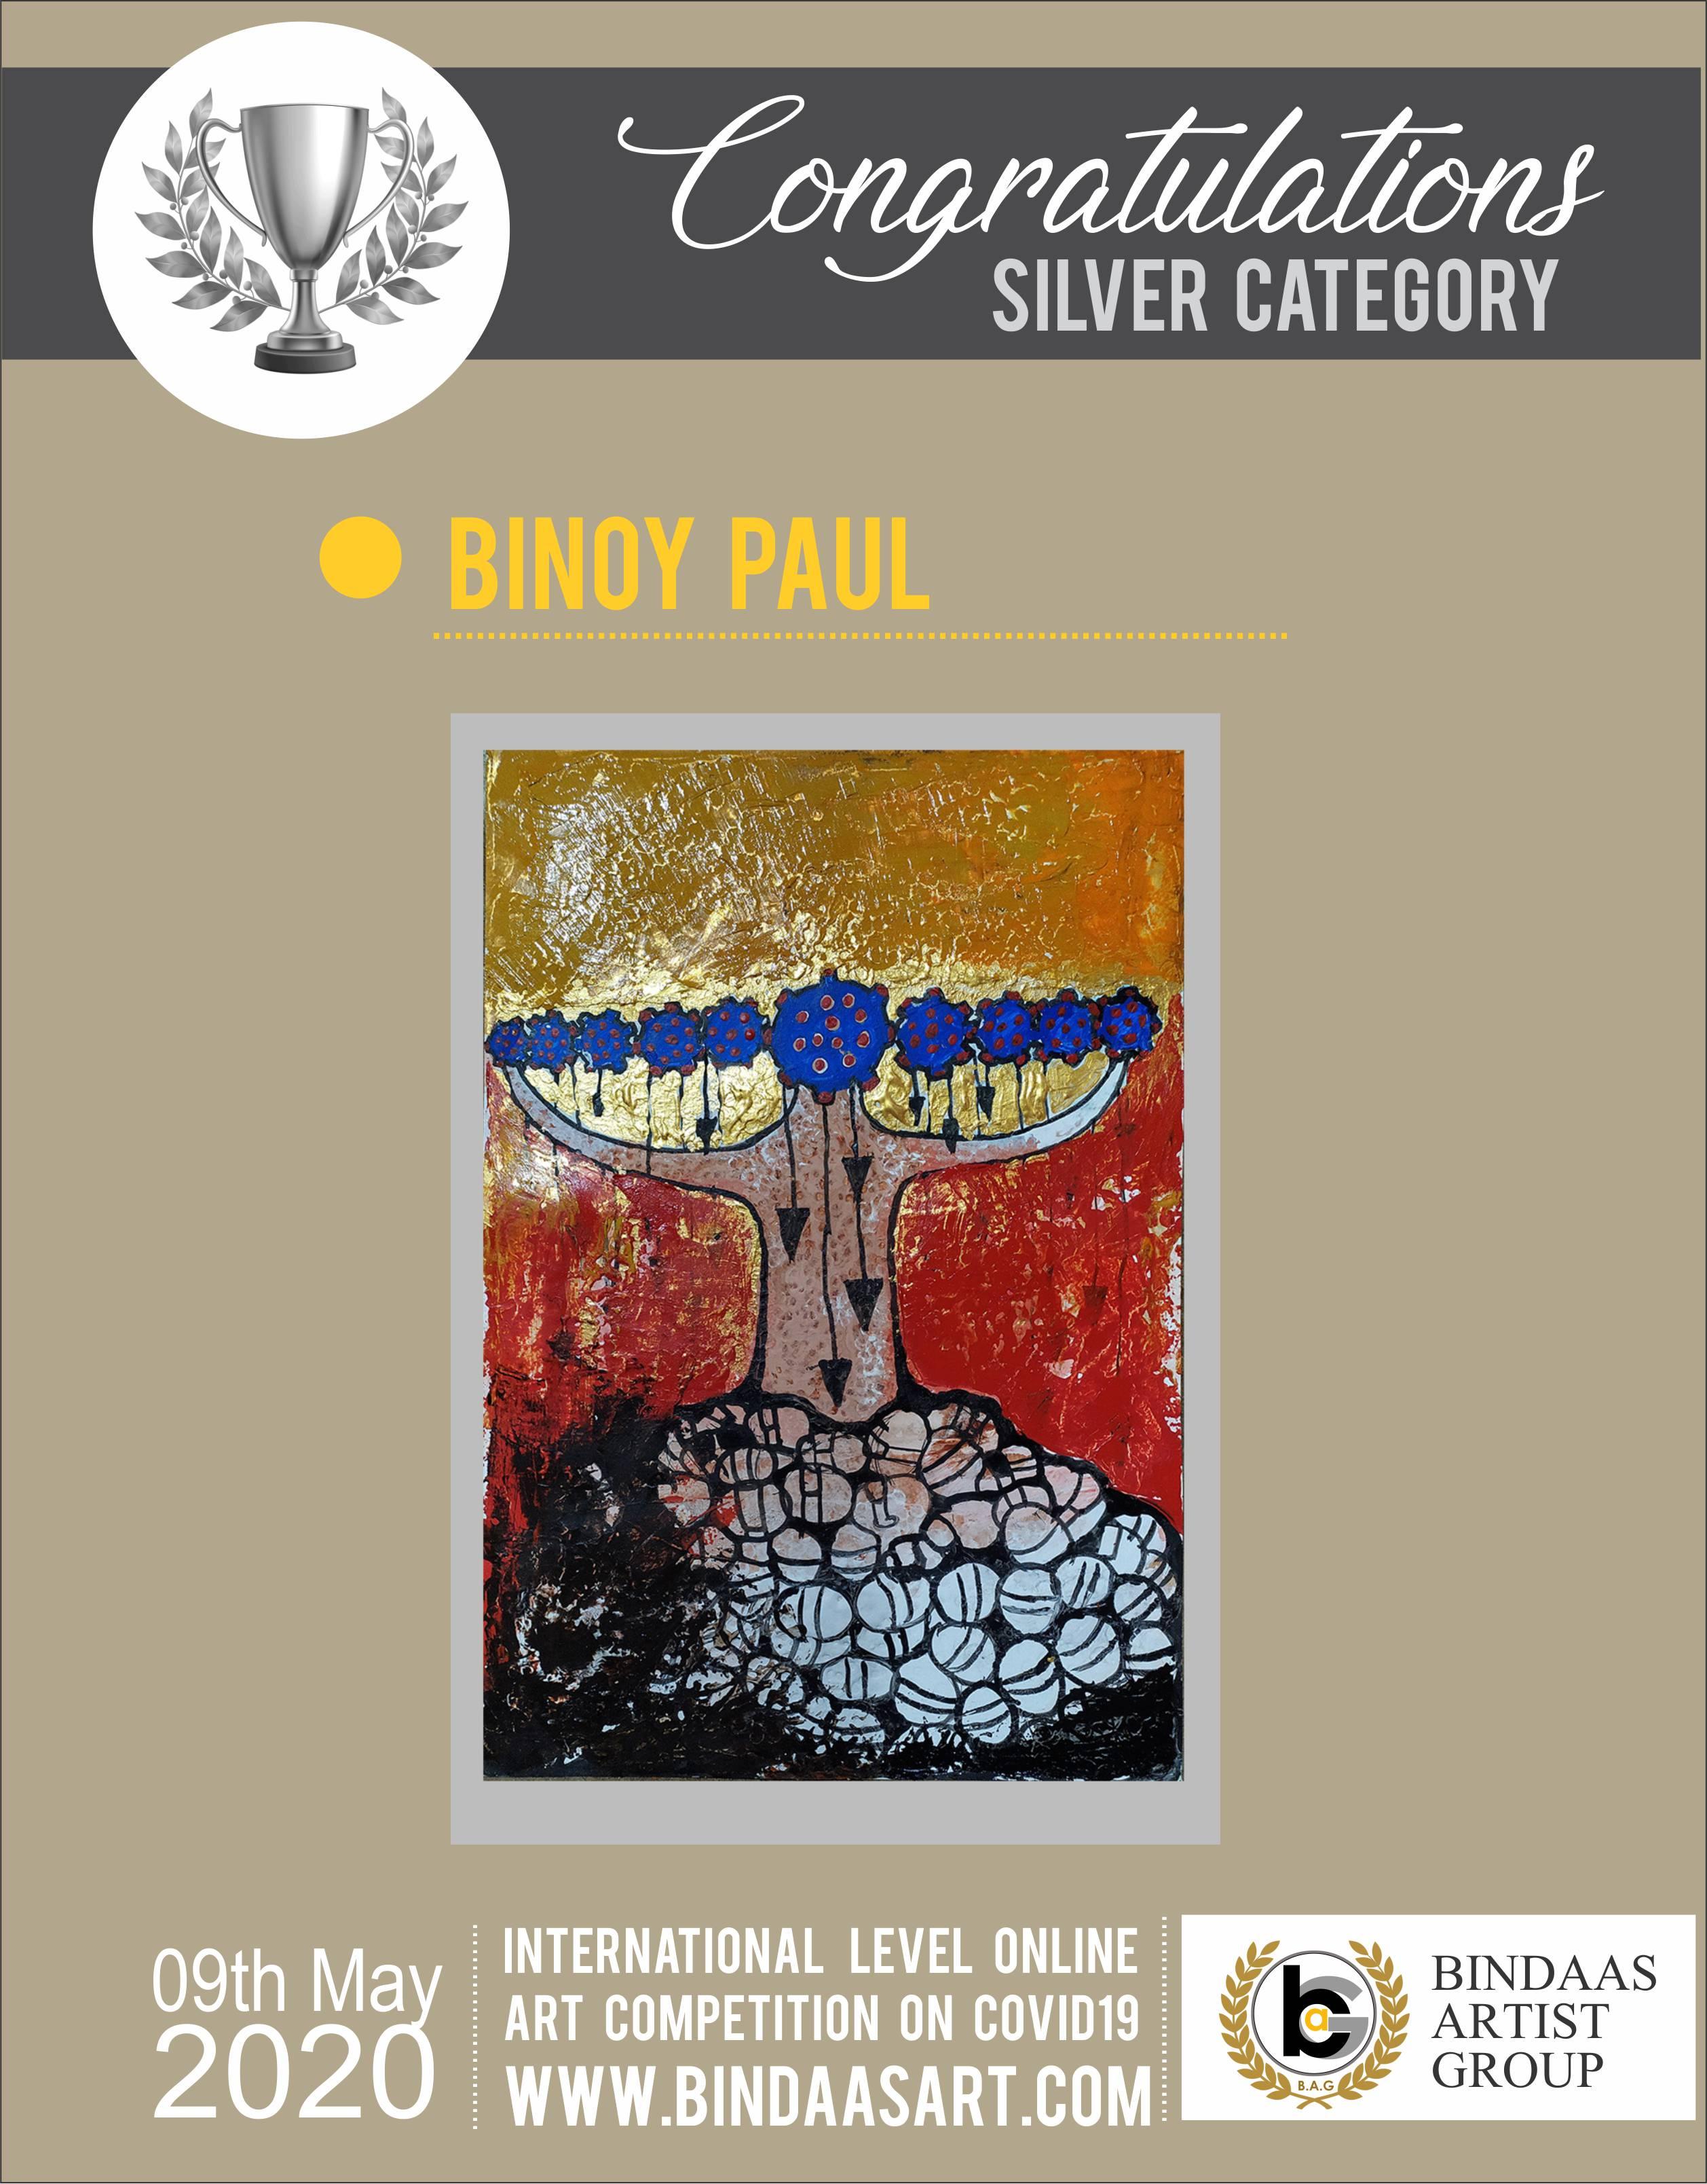 Binoy Paul